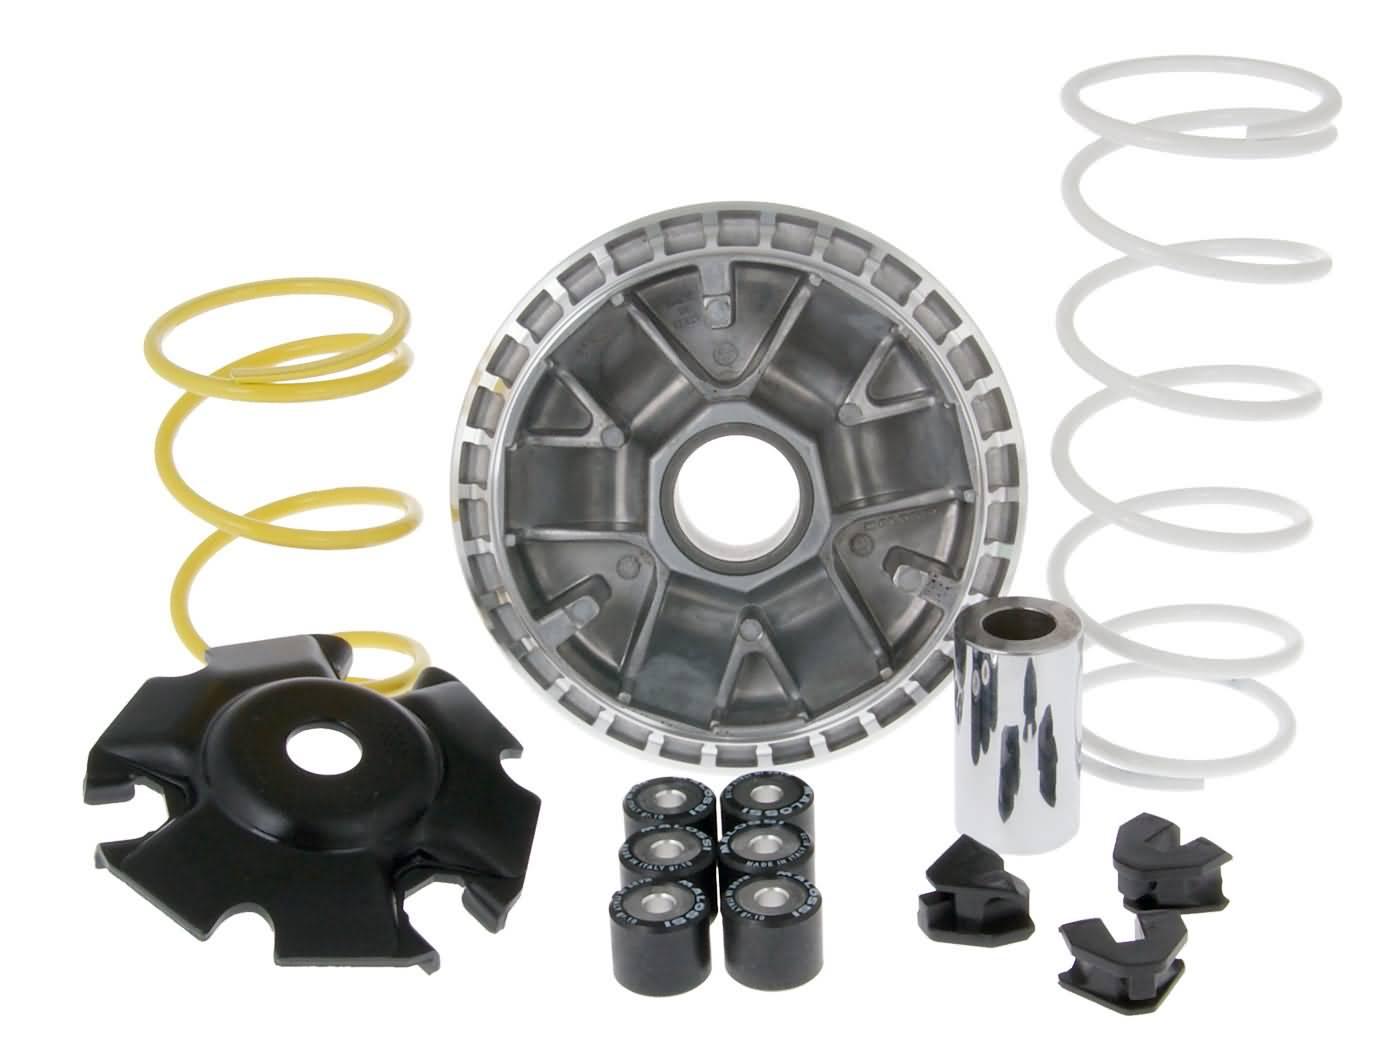 Sportvariomatik Variomatik Sport Honda Scoopy SH 125 150 125i 150i JF09 4T LC